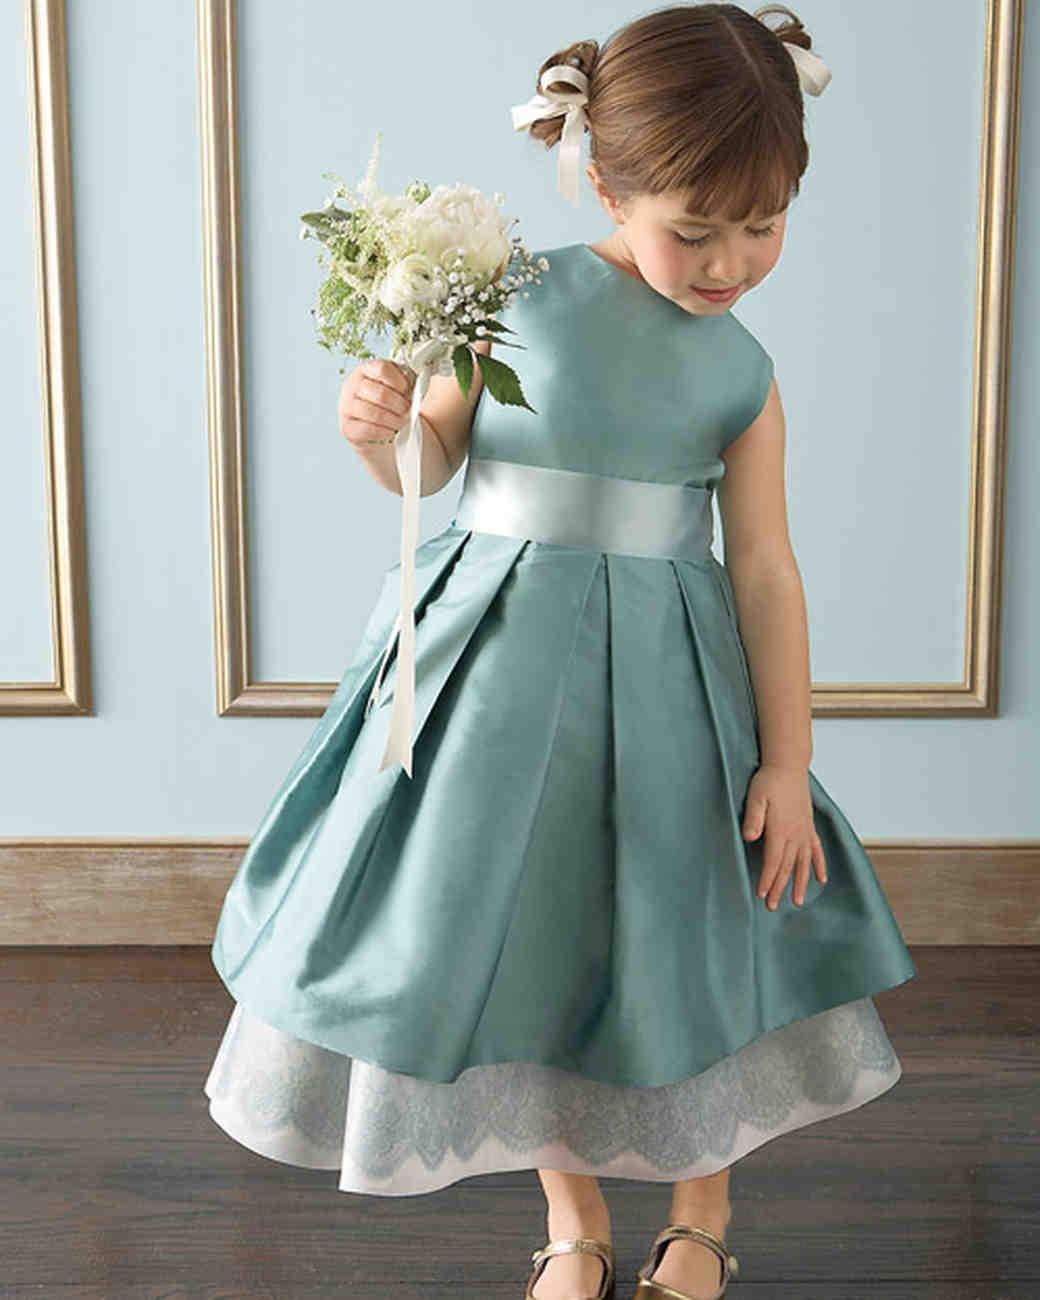 mwd104646_spr09_flowergirl14.jpg